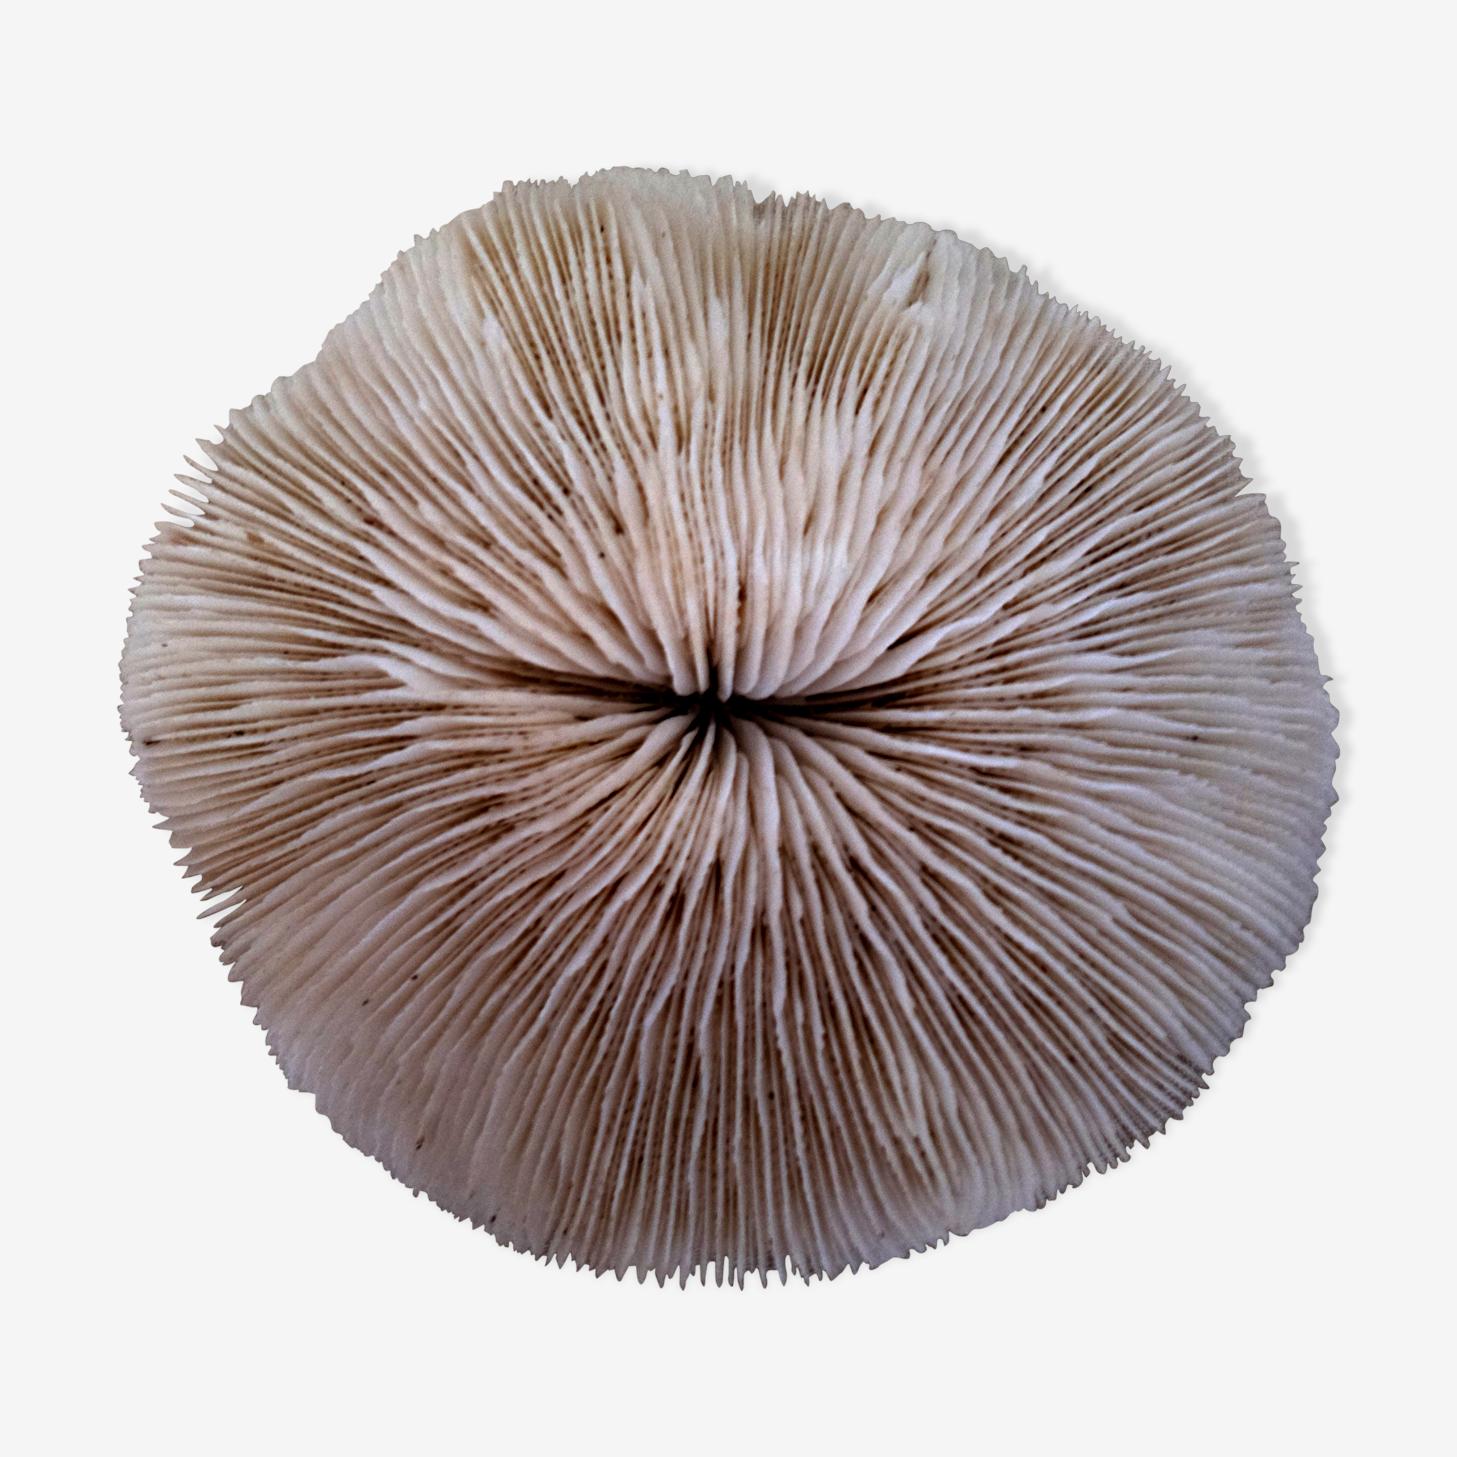 Corail Fungia Océan indien